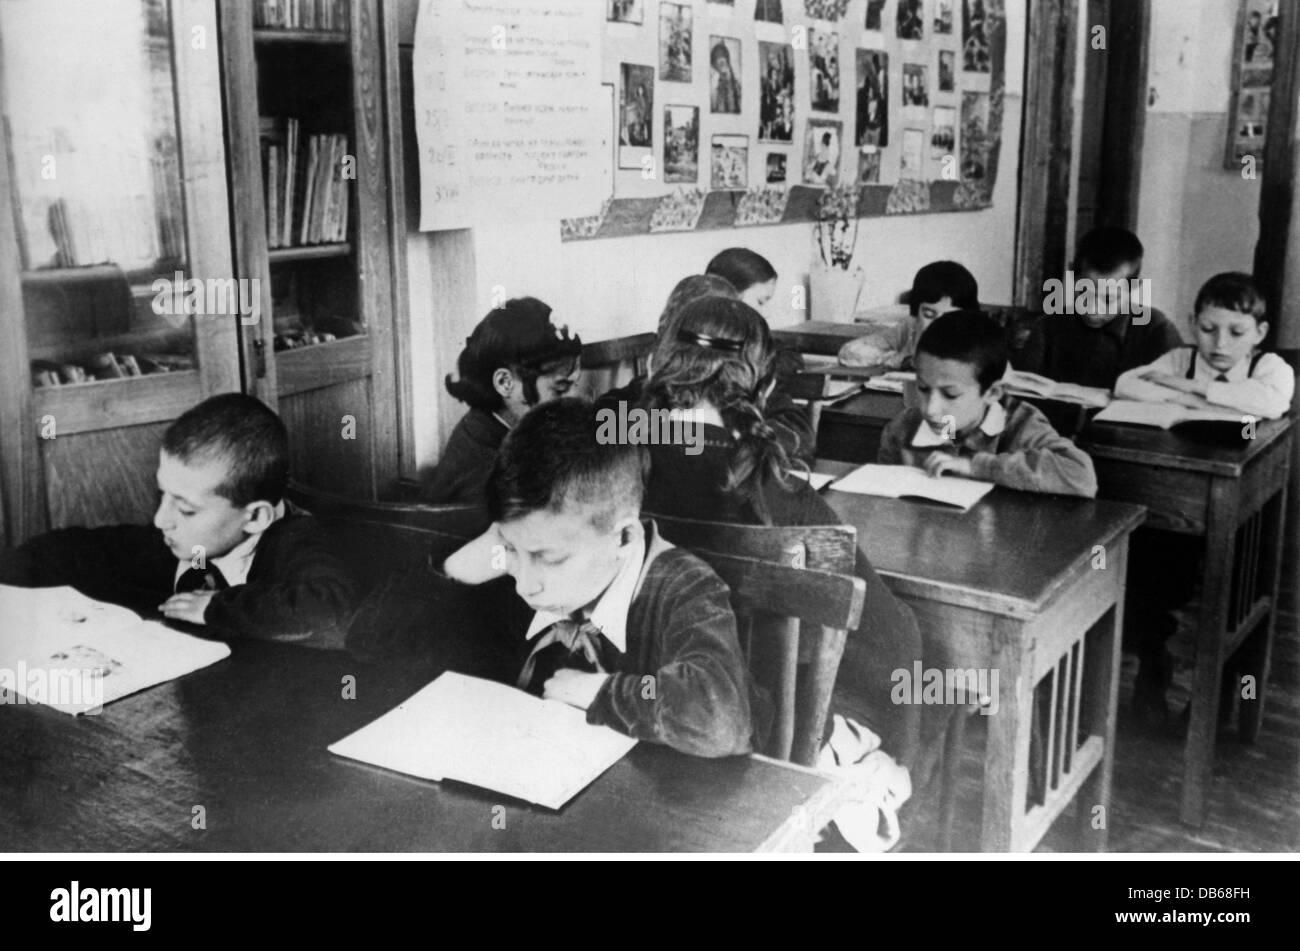 jewish library stock photos - photo #23